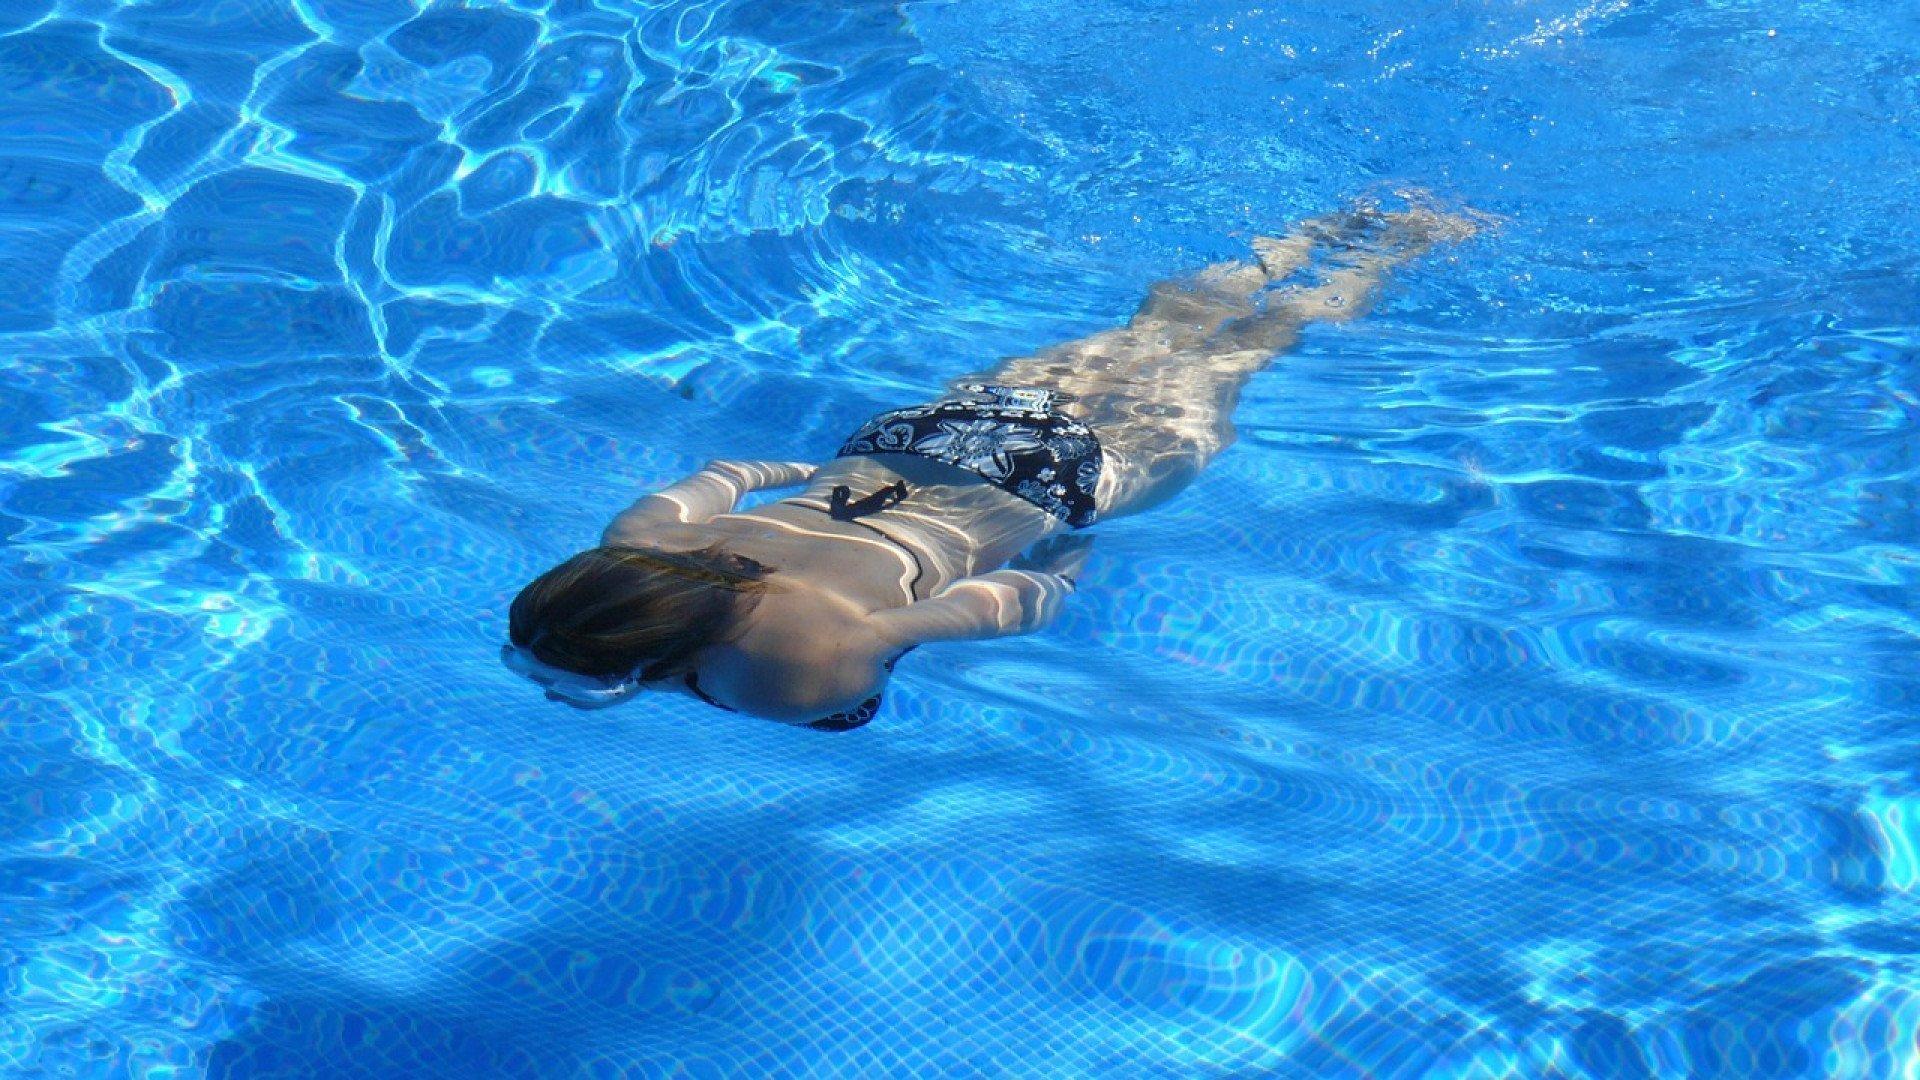 Comment bien entretenir sa piscine ? 1